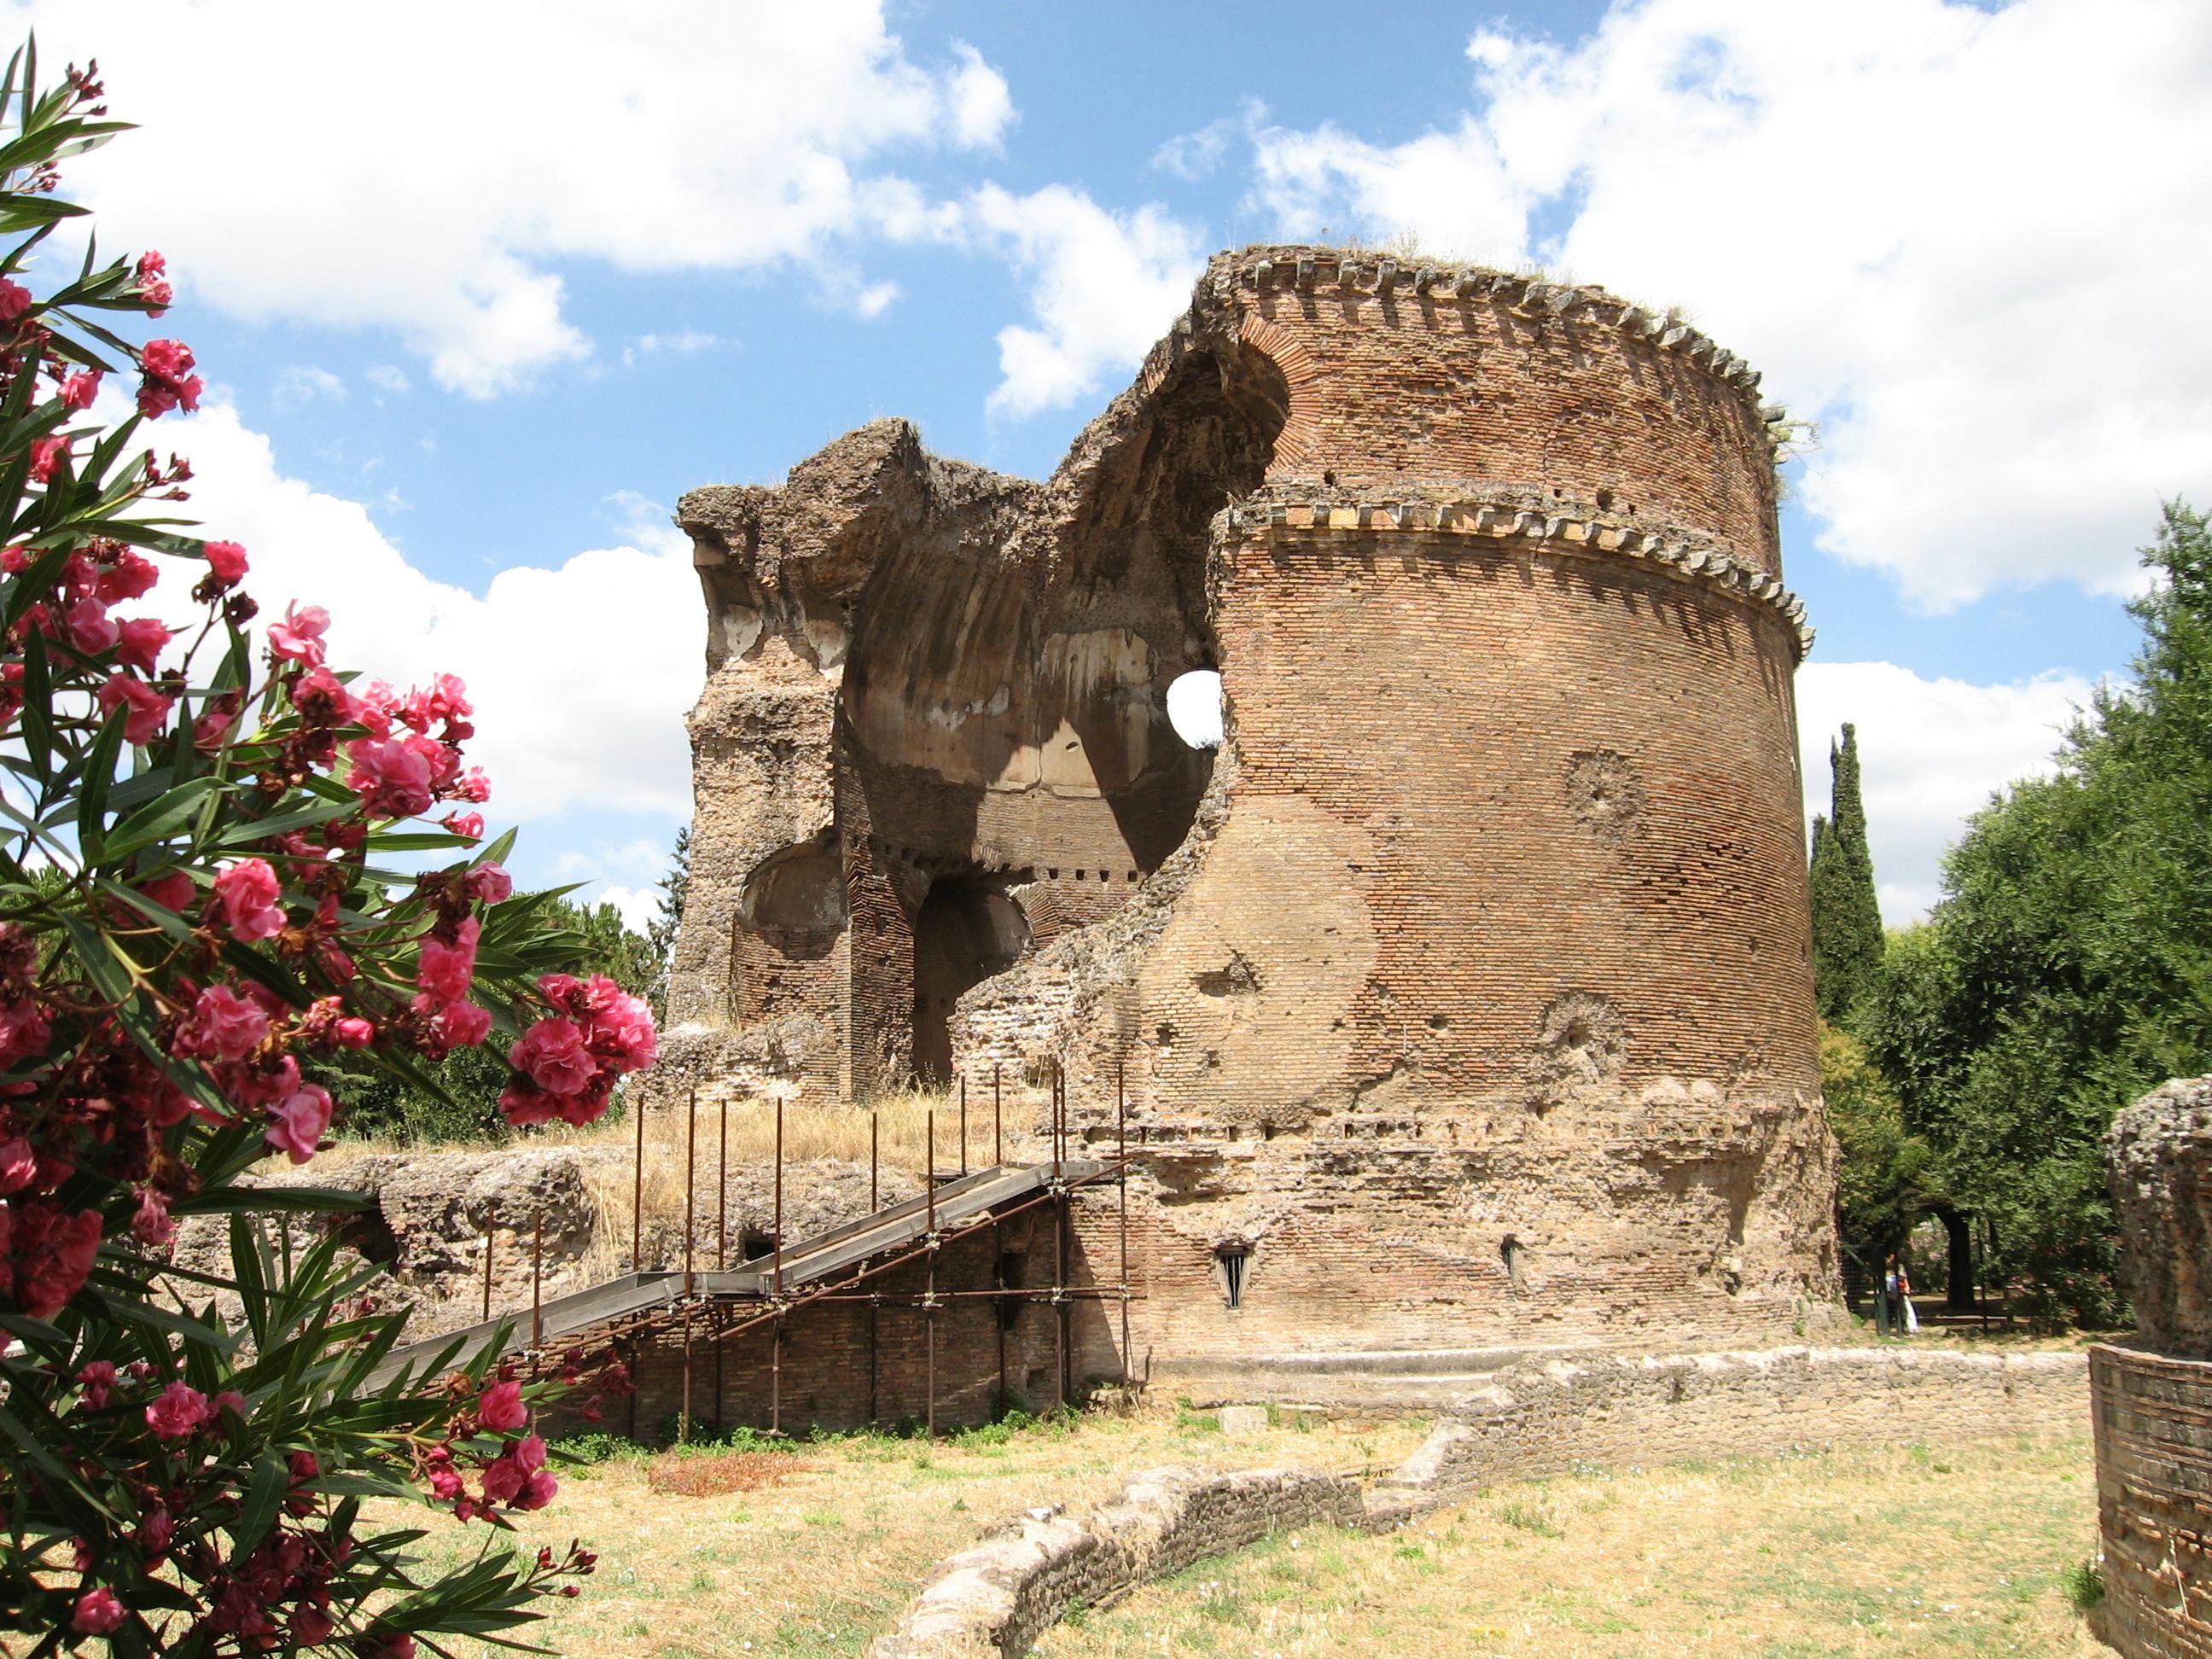 Villa_Gordiani_-_Park_of_Rome_a